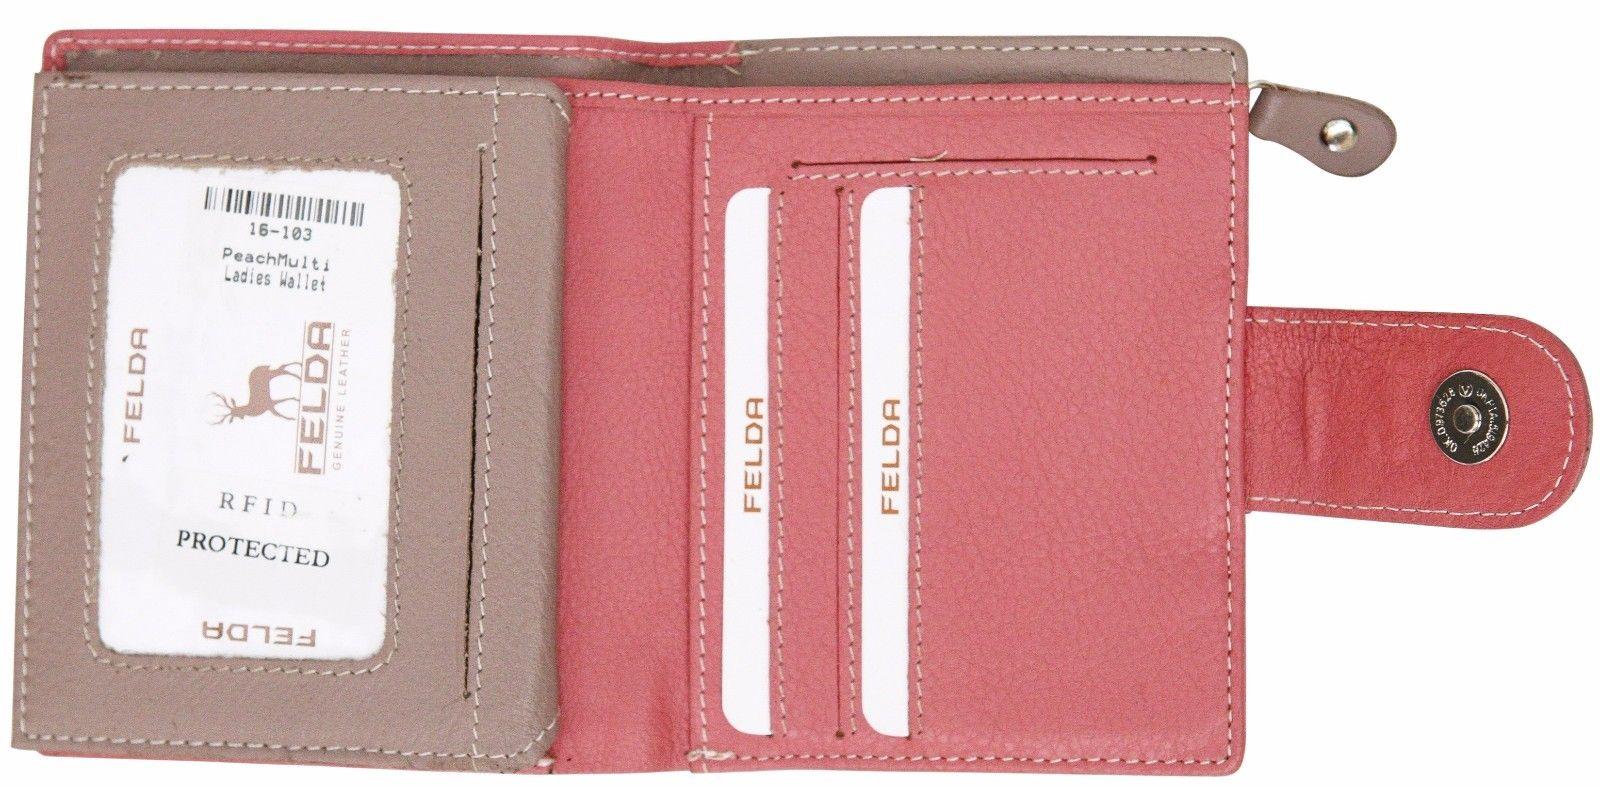 Felda-RFID-onorevoli-MEDAGLIA-amp-Card-Purse-Wallet-Genuine-Leather-Multi-SOFT-BOX-REGALO miniatura 90